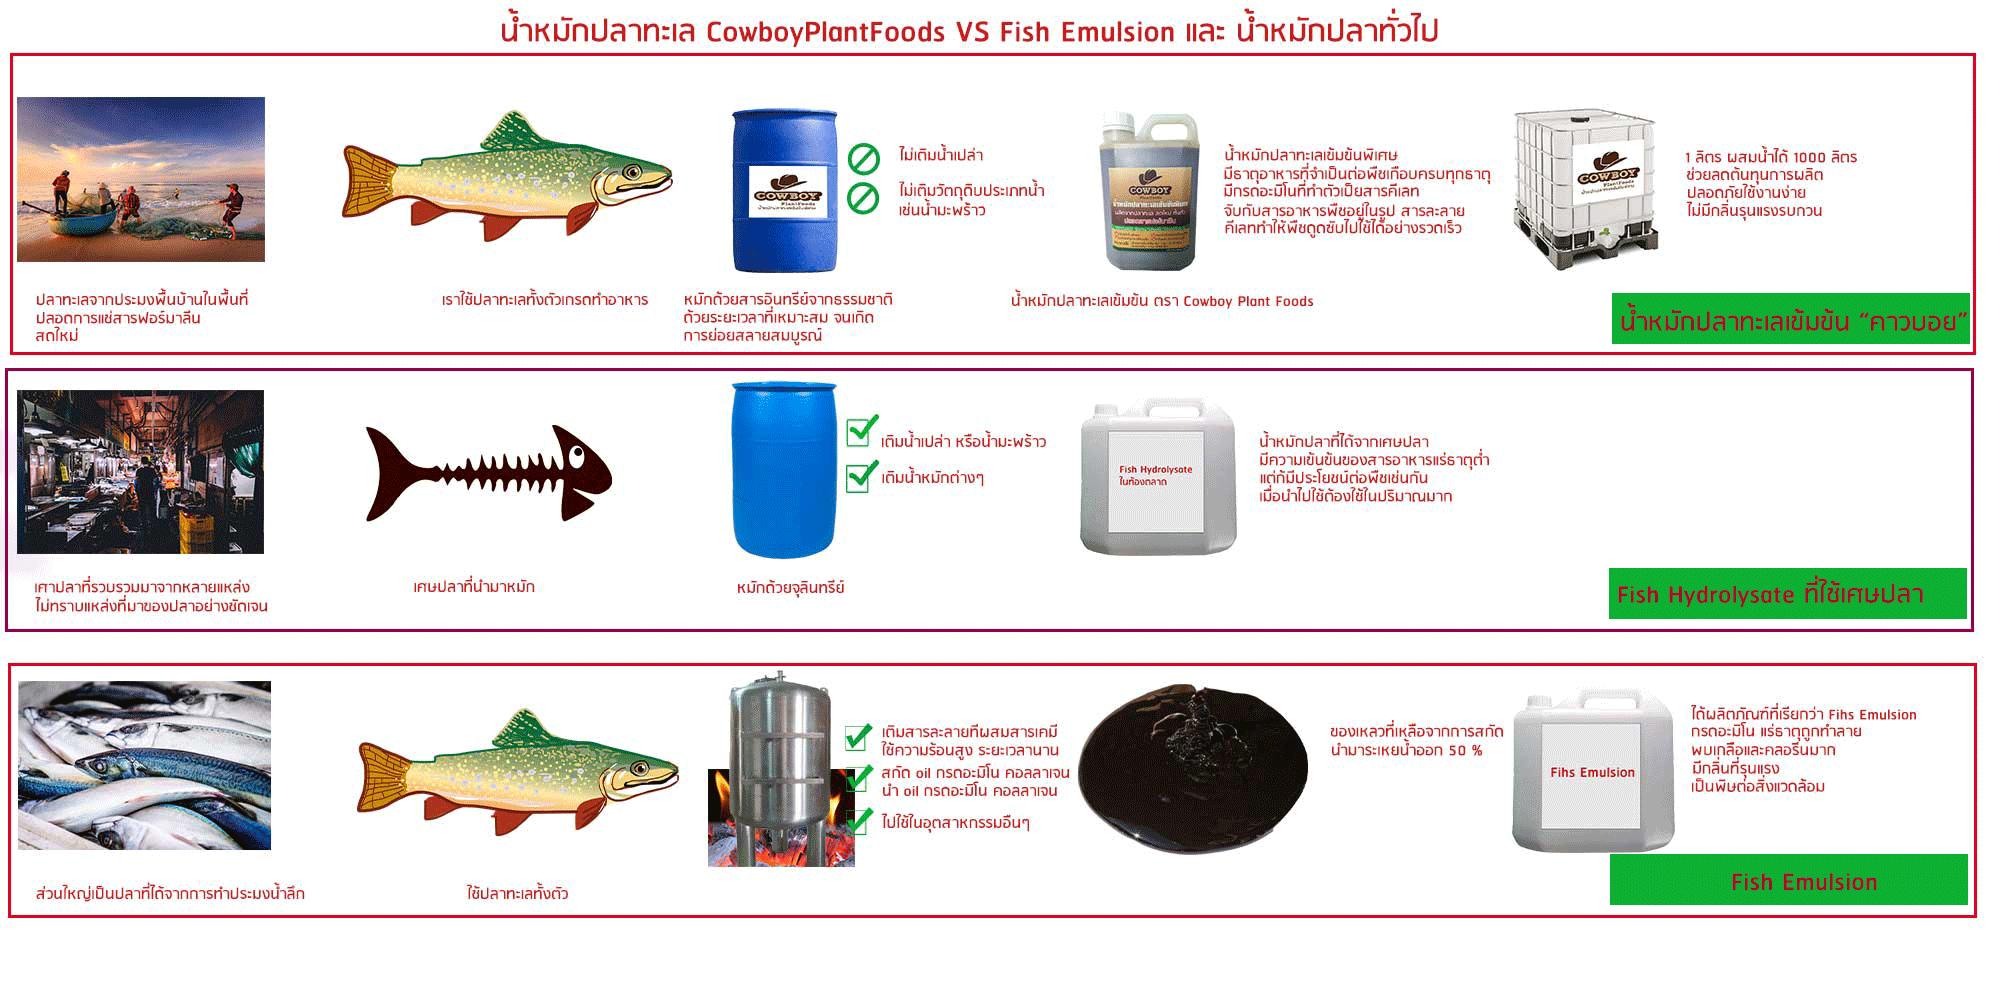 Fish Hydrolysate VS Fish emulsion